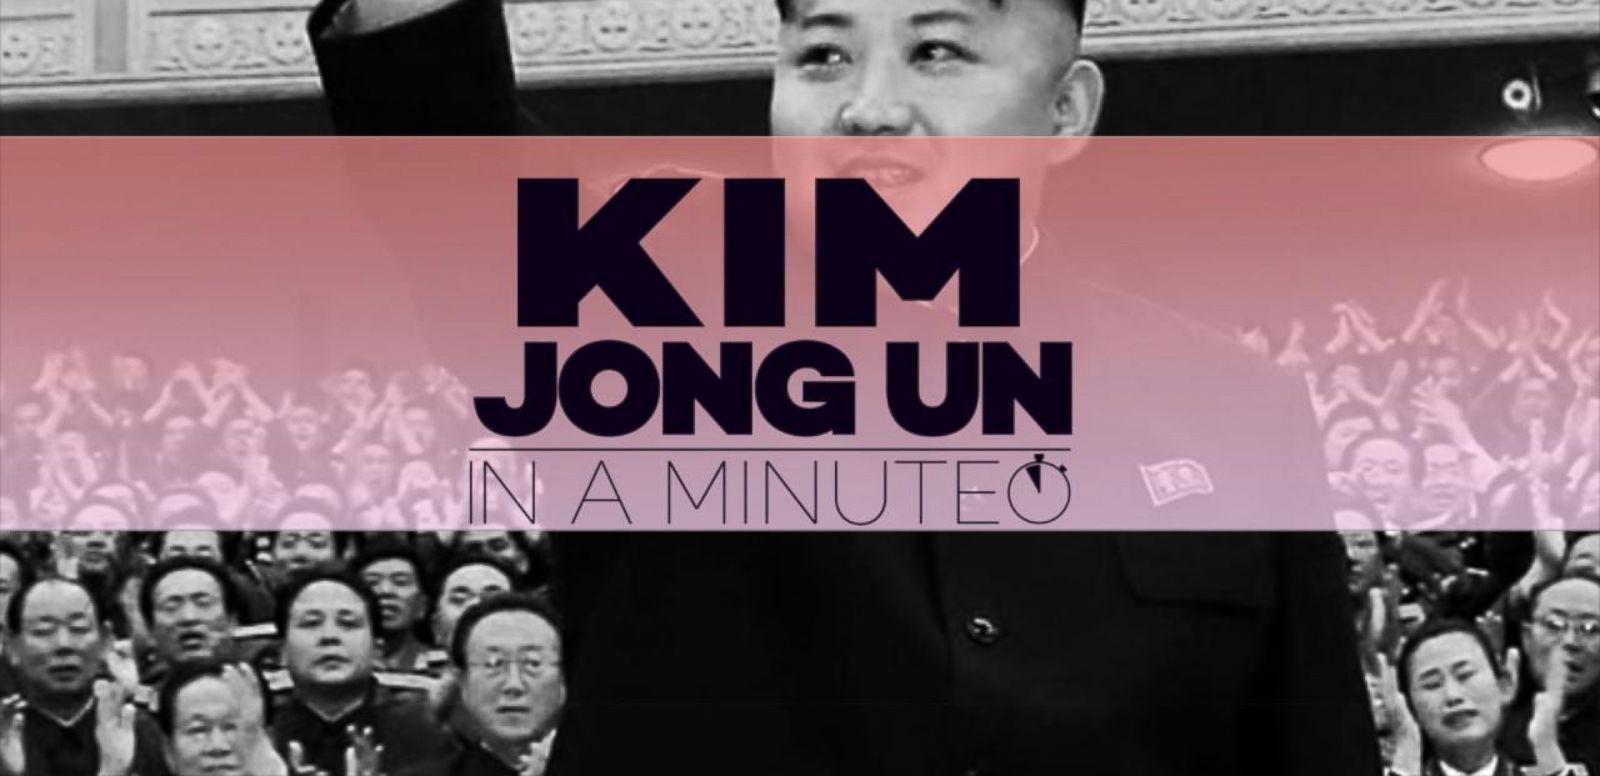 VIDEO: Kim Jong Un: In A Minute